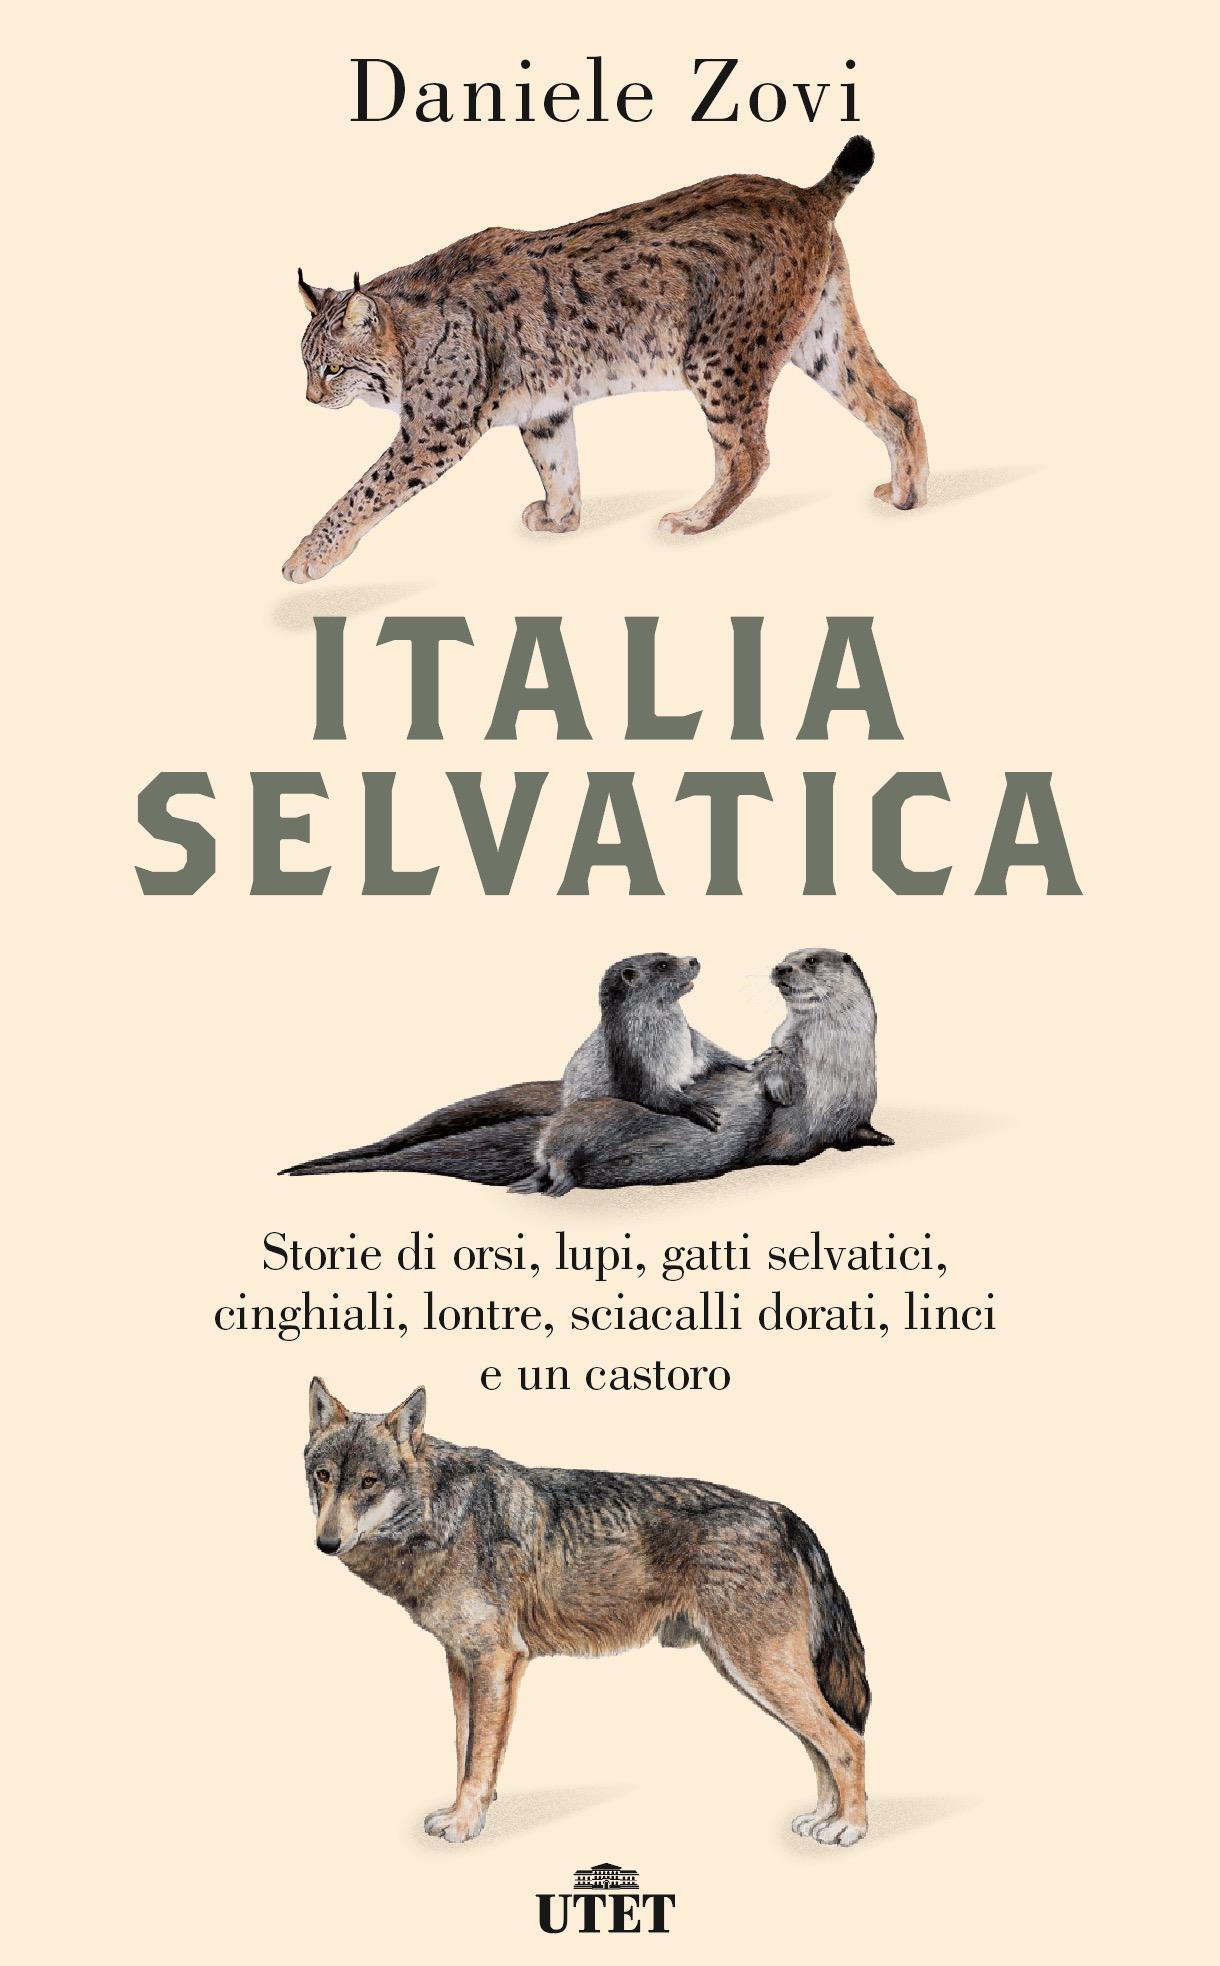 Italia selvatica – Daniele Zovi